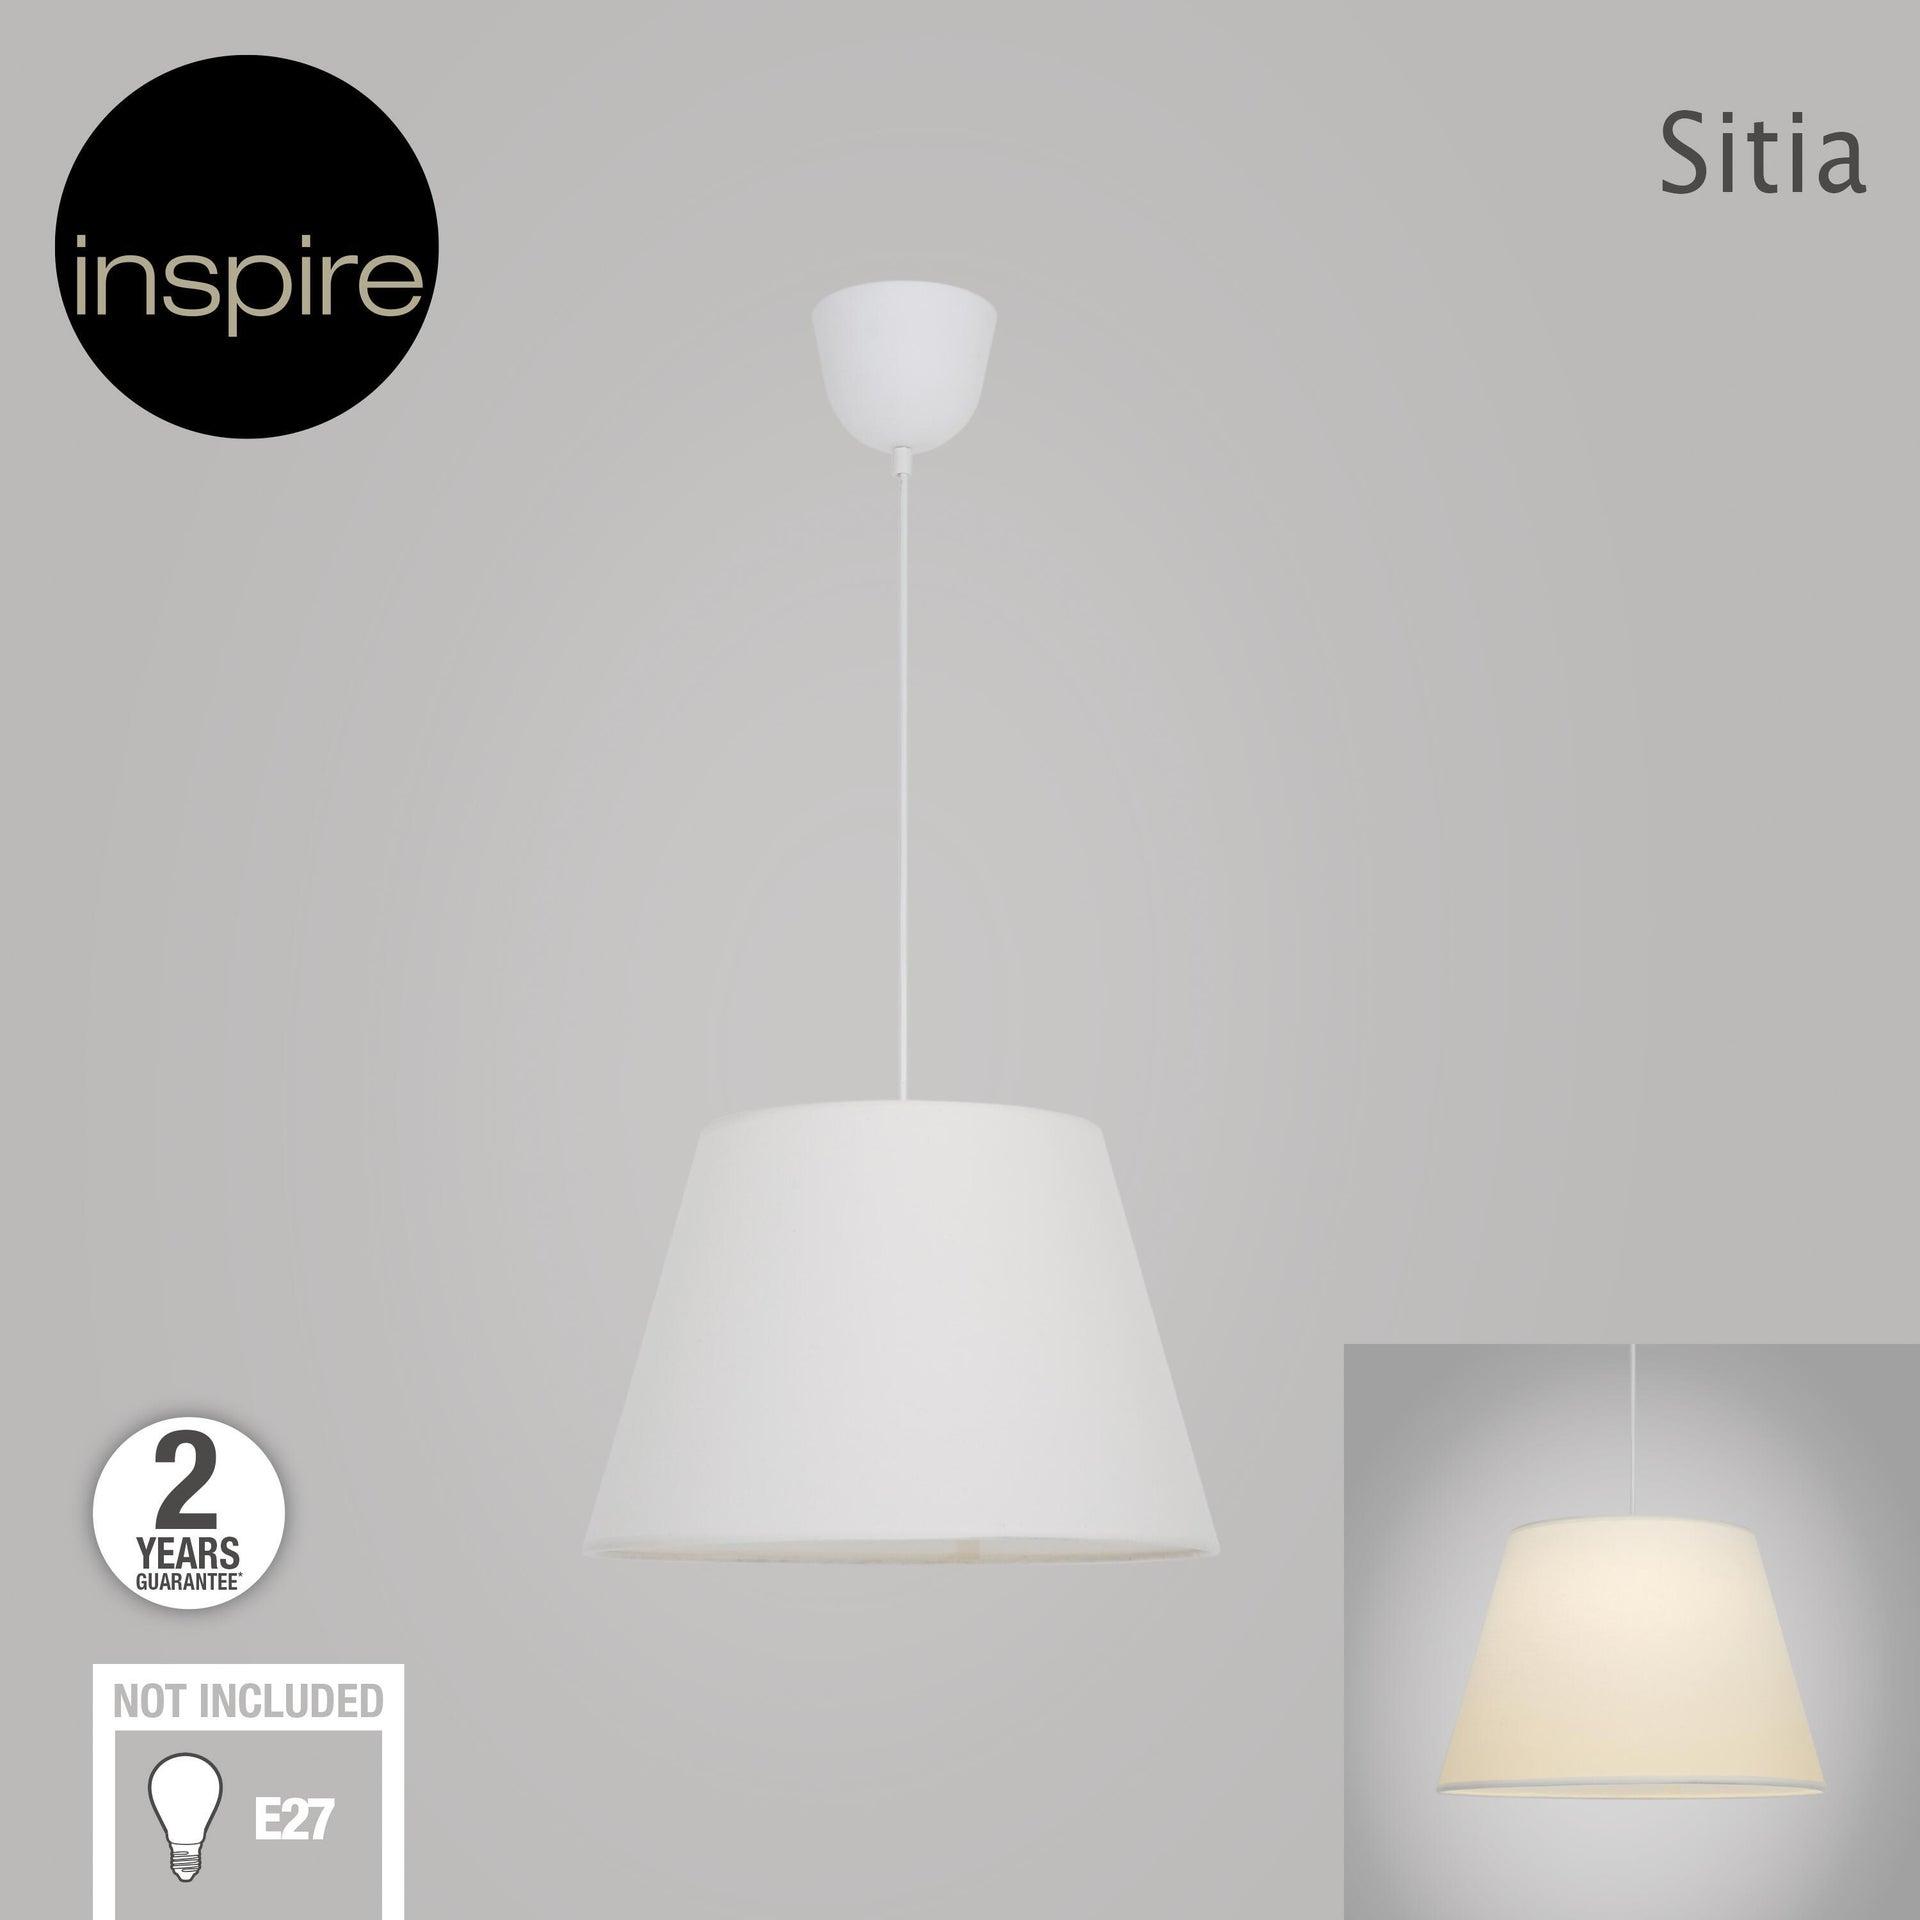 Lampadario Moderno Sitia bianco in tessuto, D. 38 cm, L. 25 cm, INSPIRE - 2